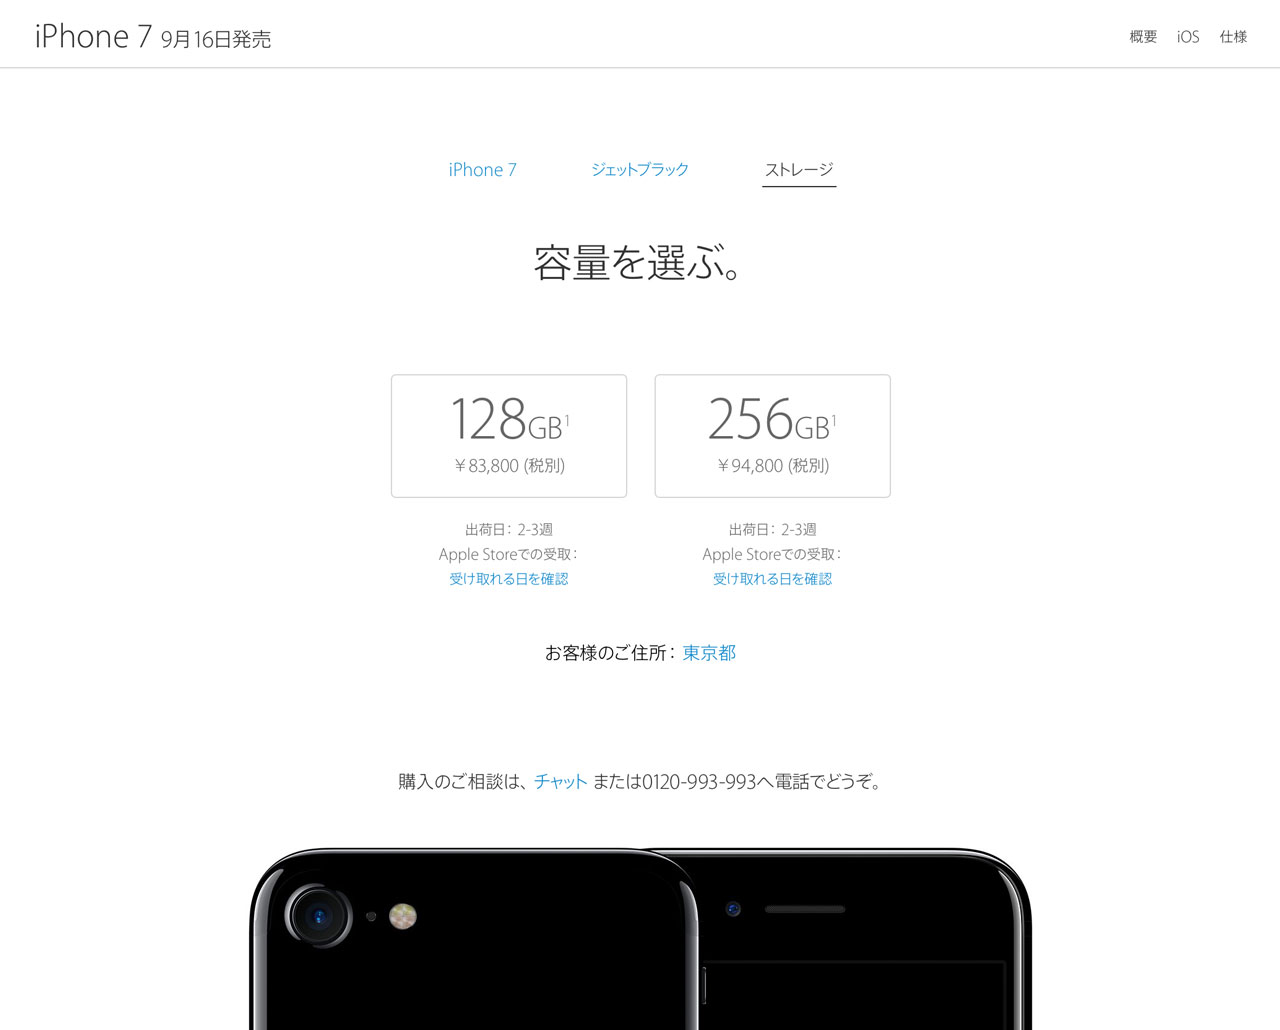 iphone-7-apple-store-japan-3